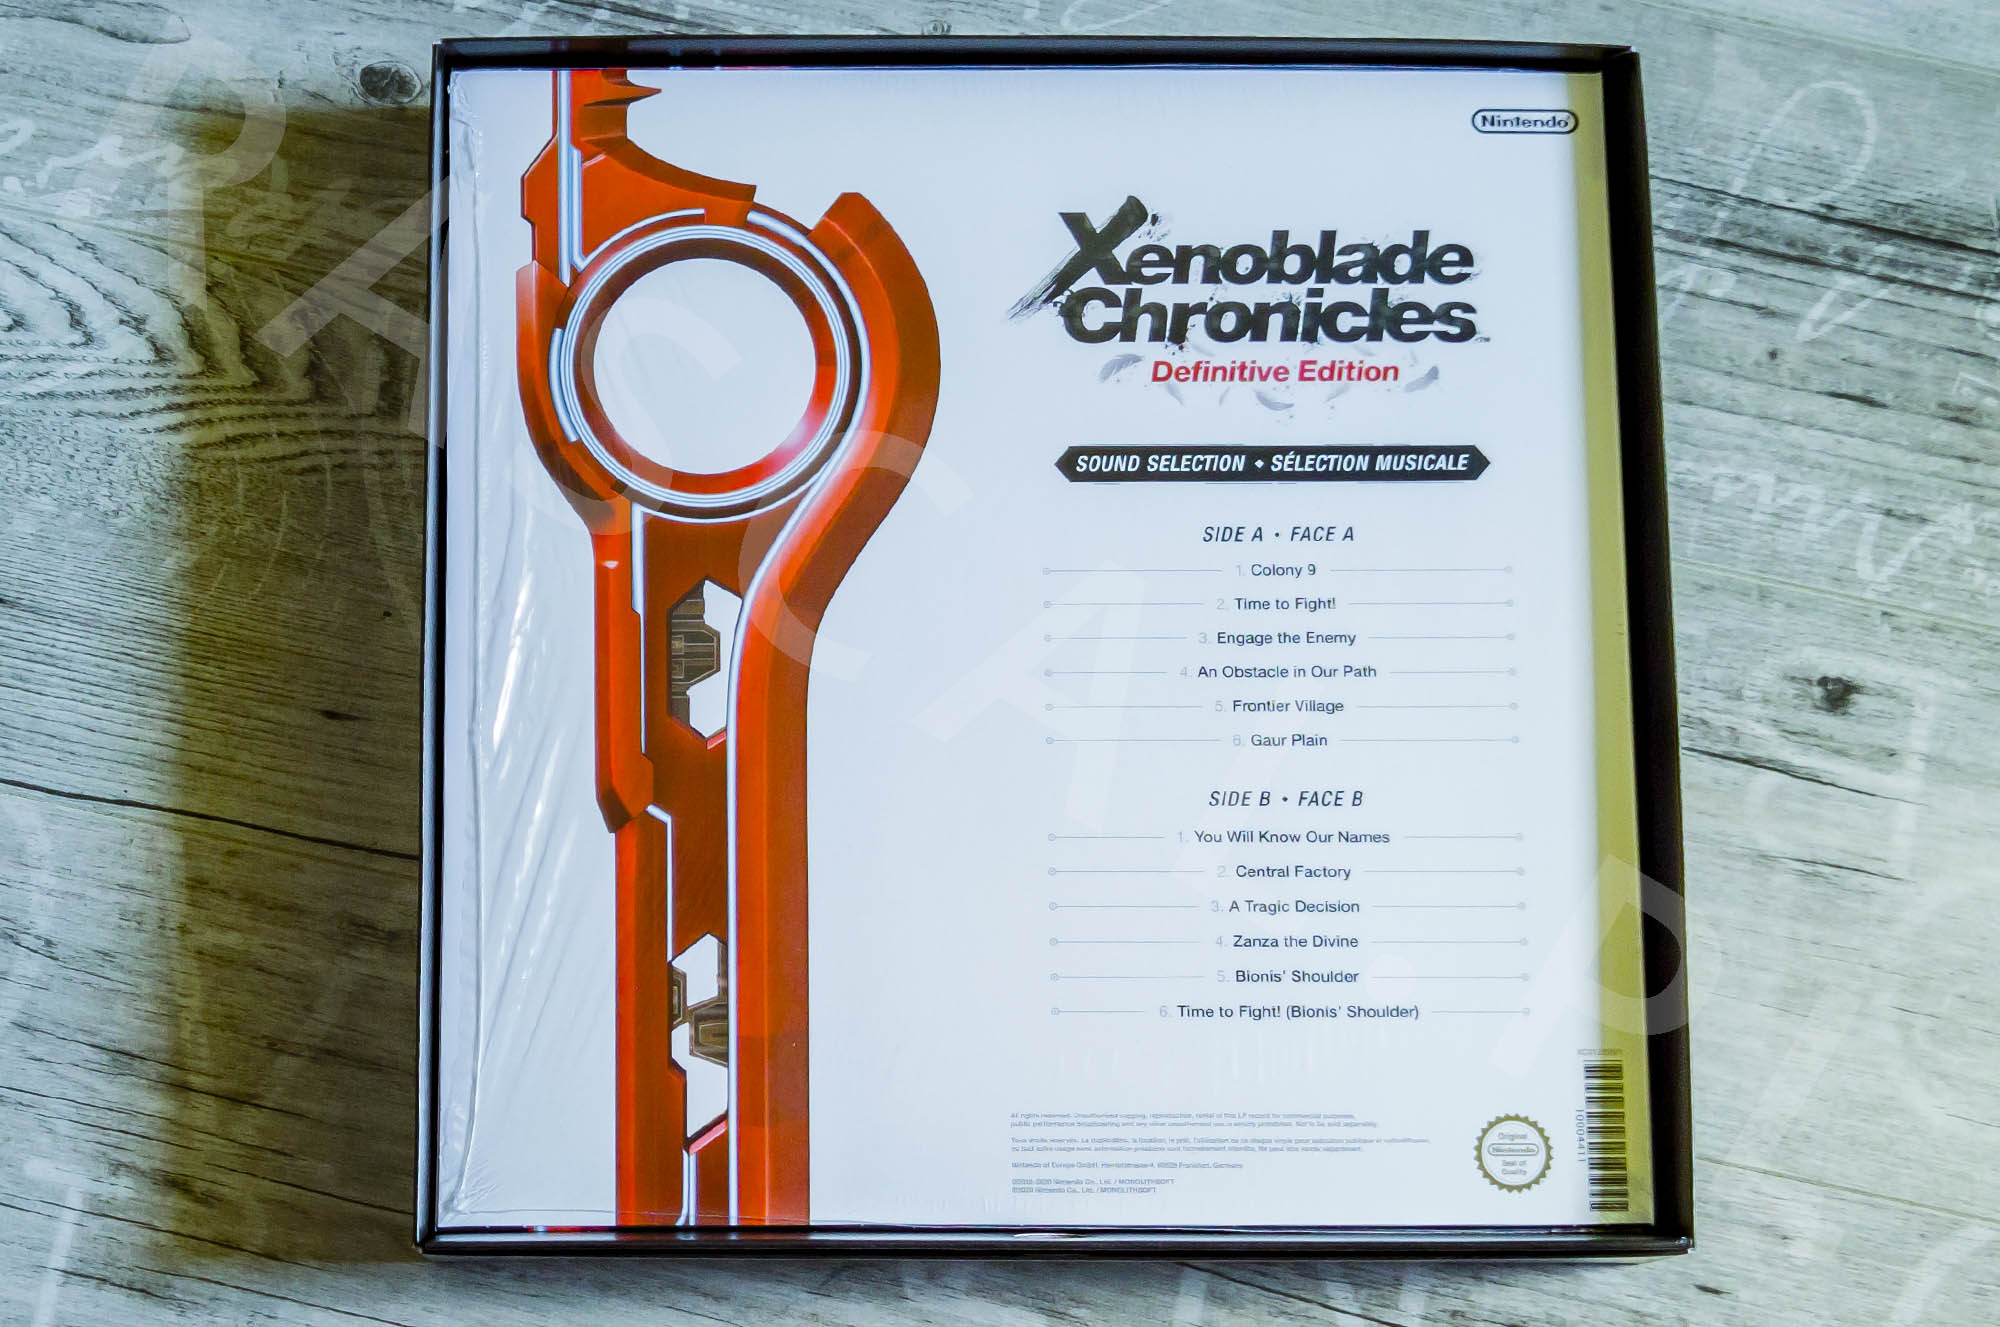 Xenoblade Chronicles Definitive Edition Collectors Set - Vinyl - Tył Opakowania